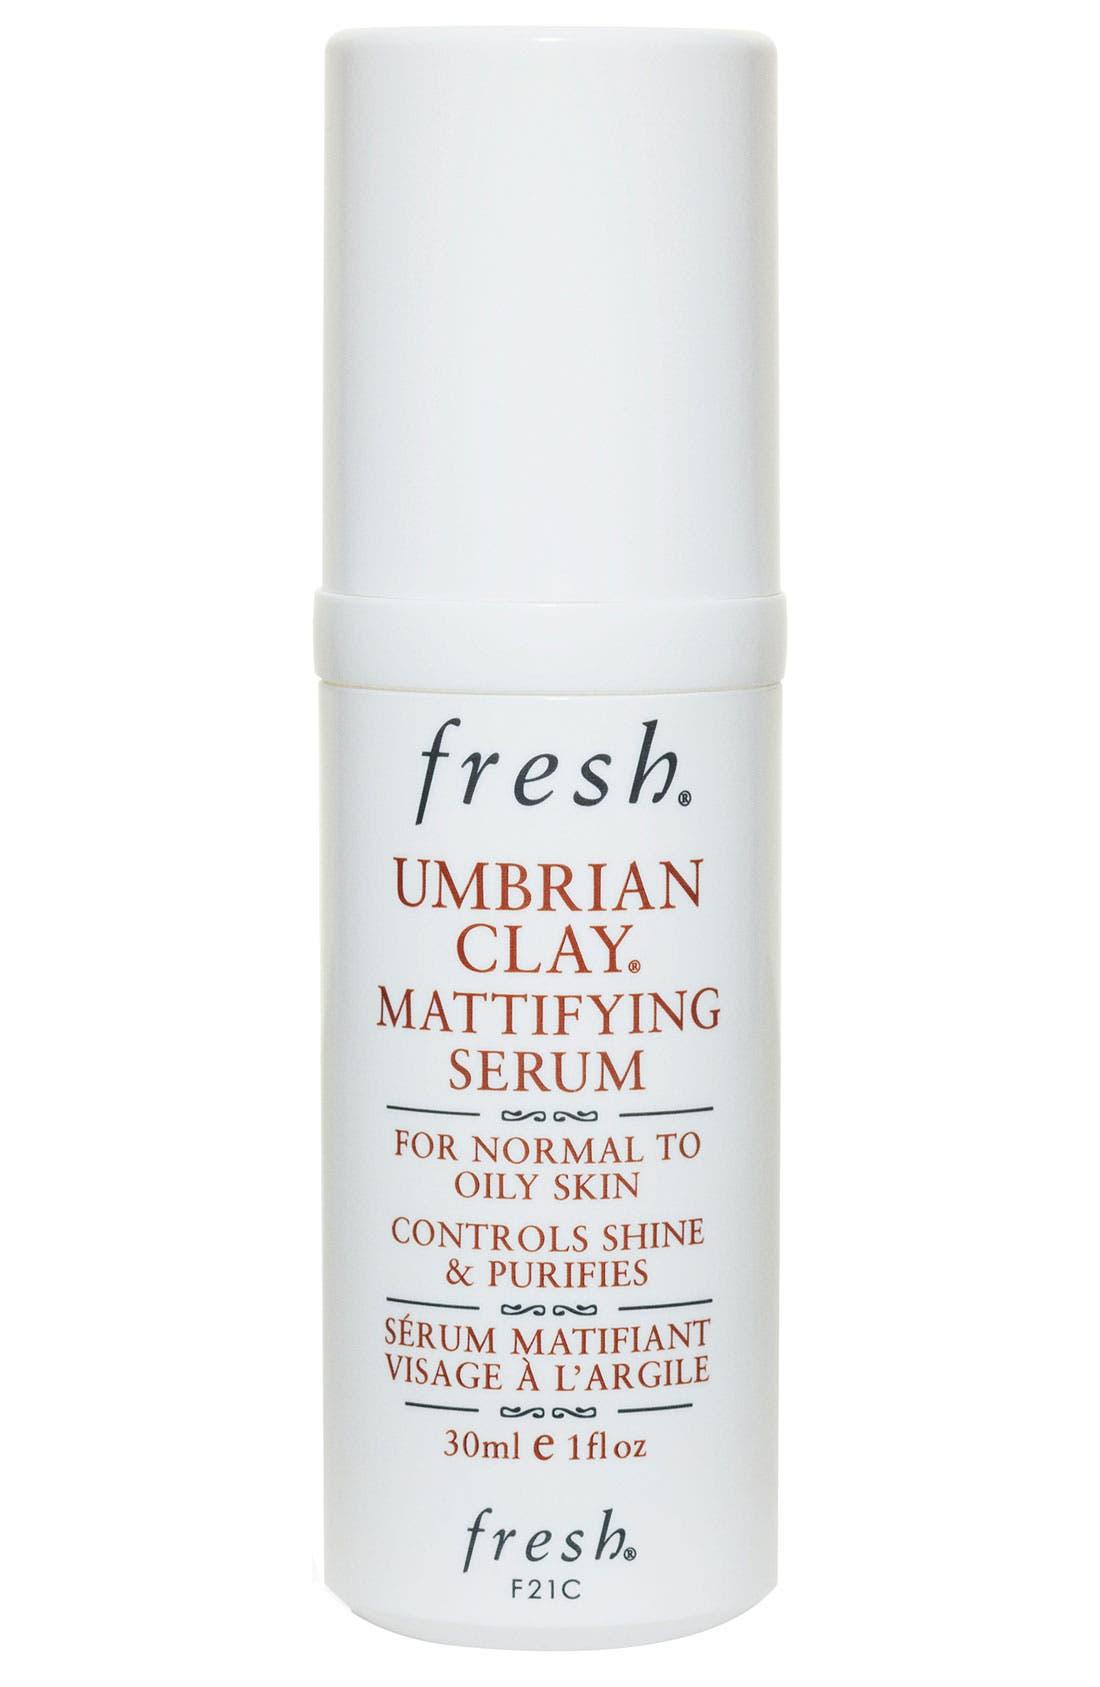 Fresh® Umbrian Clay Mattifying Serum